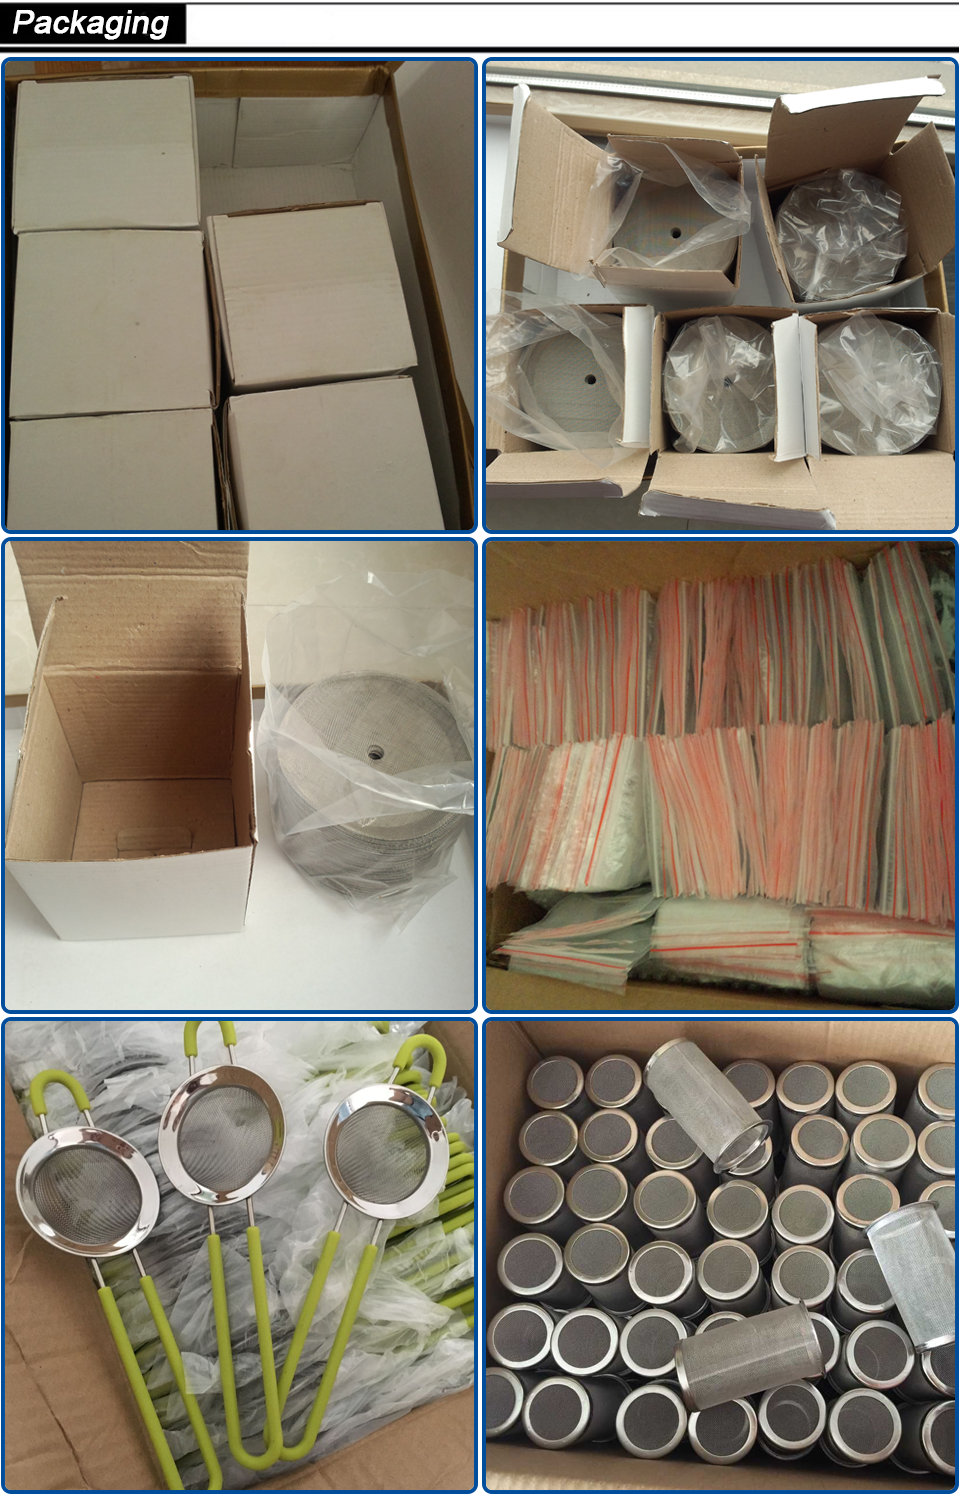 304 316 Edelstahl Draht 4 Mikron Mesh Wasser Filter Discs